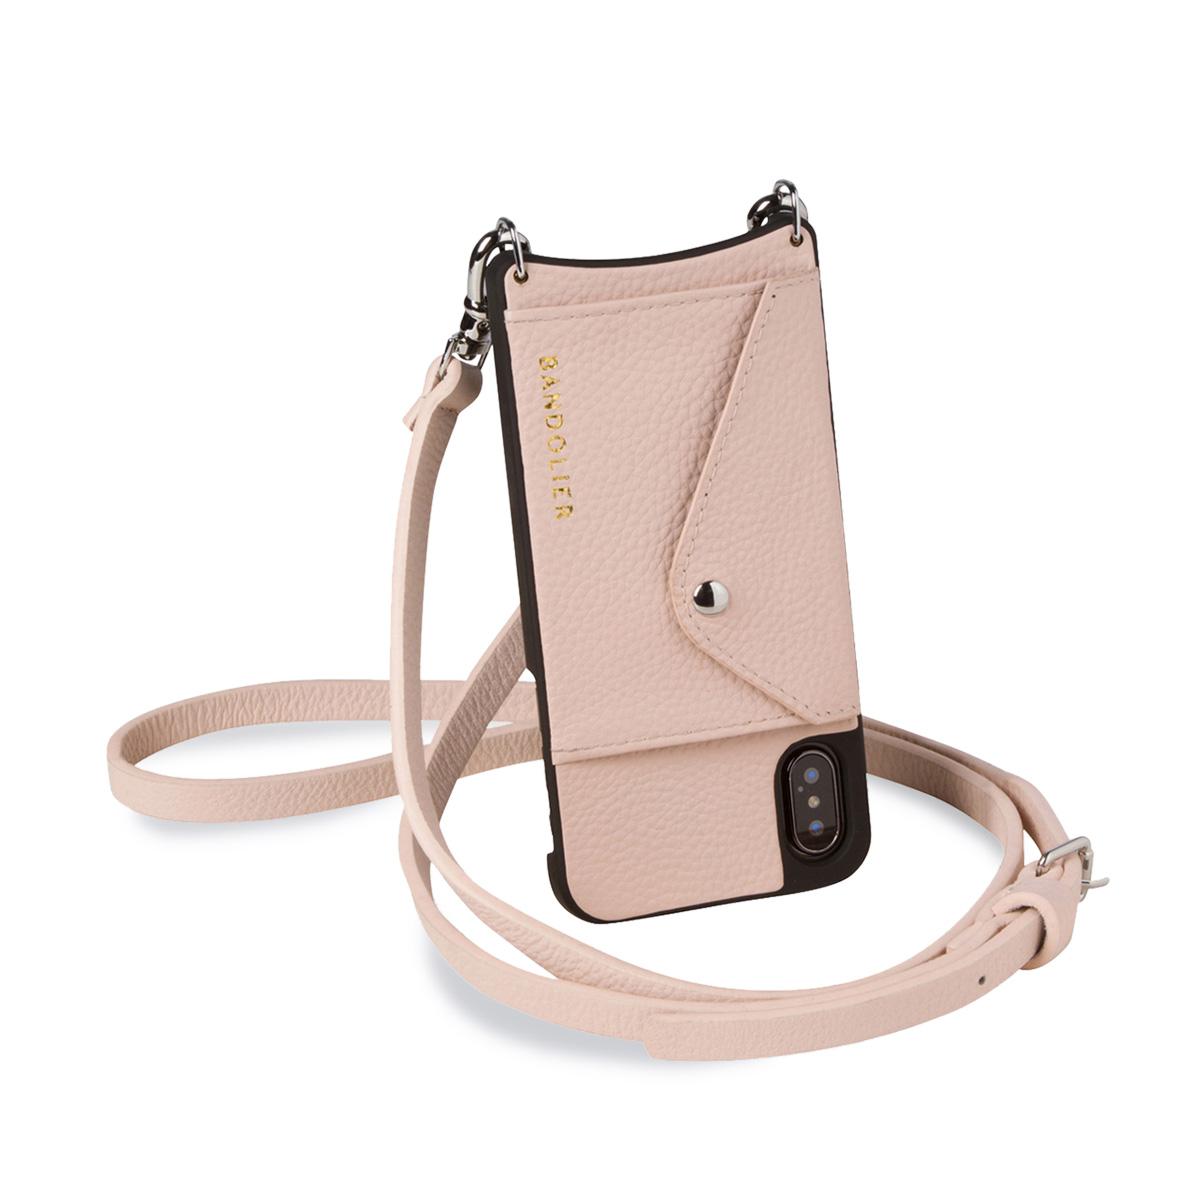 BANDOLIER DONNA SIDE SLOT PINK バンドリヤー iPhoneXS X ケース スマホ 携帯 ショルダー アイフォン メンズ レディース レザー ピンク 14DON